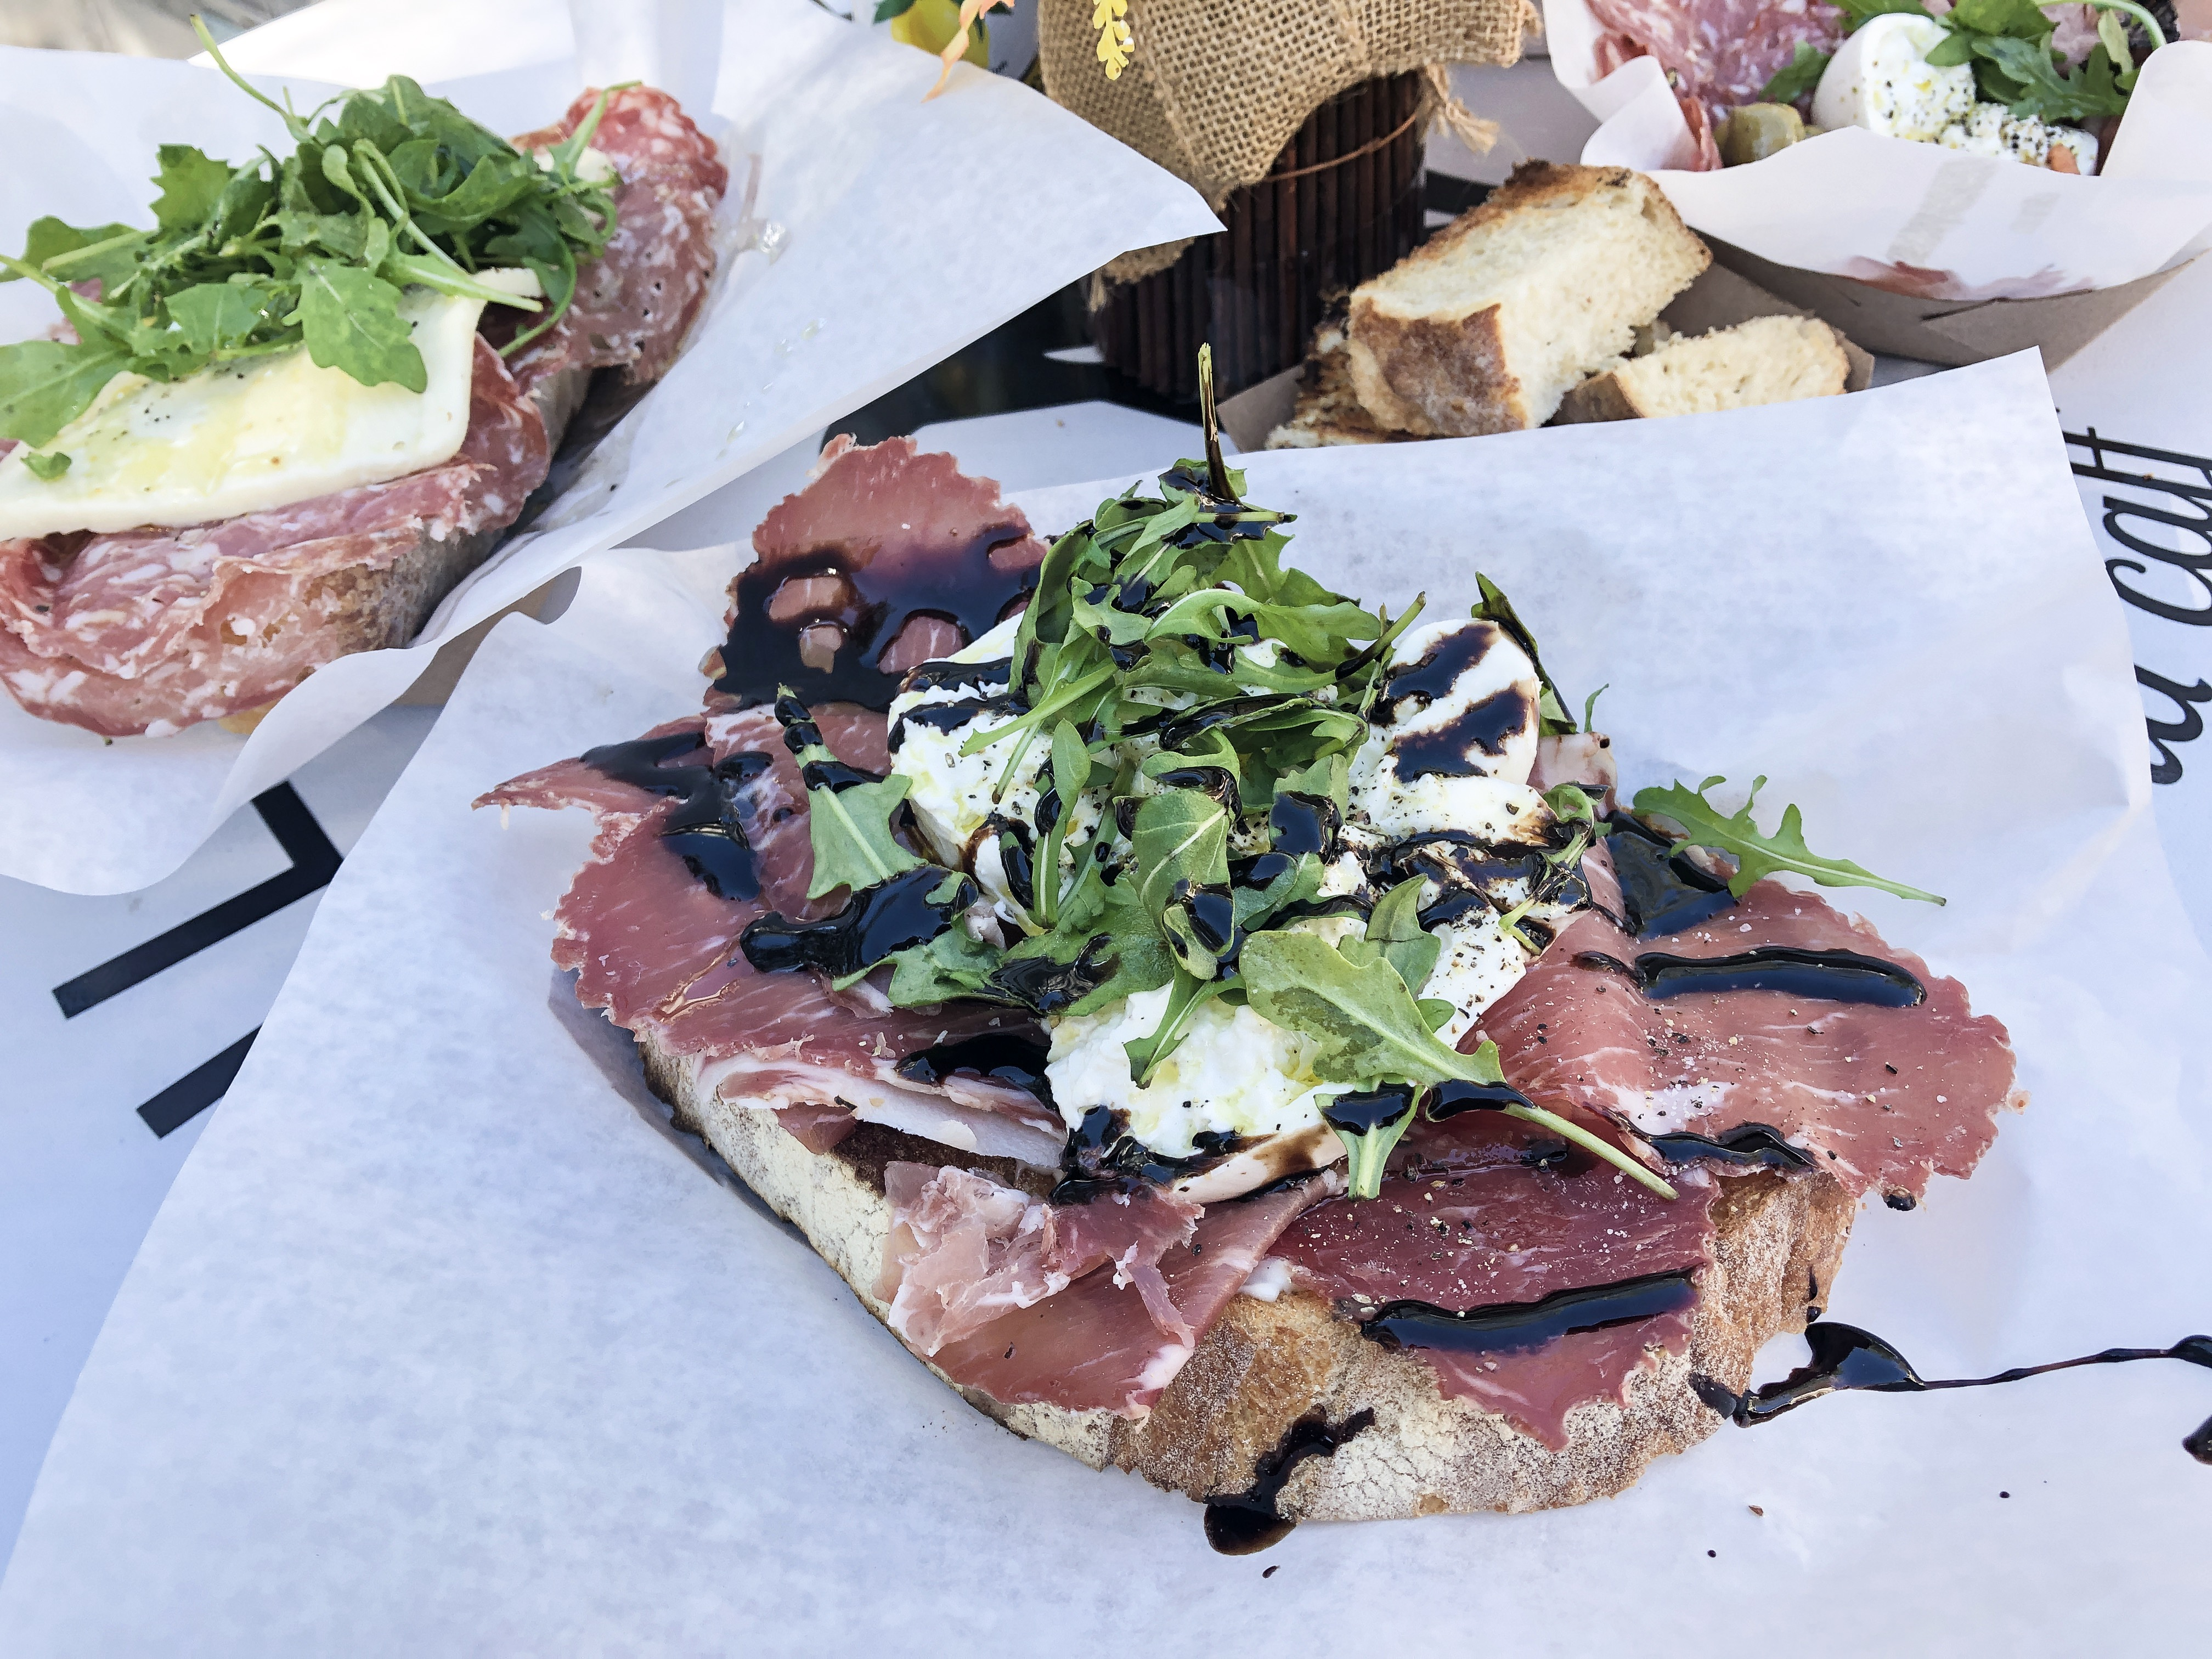 Firenze Love Crostini with imported capicolla, creamy truffle infused burrata cheese, Mayo Arugula and Porcini mushroom glaze